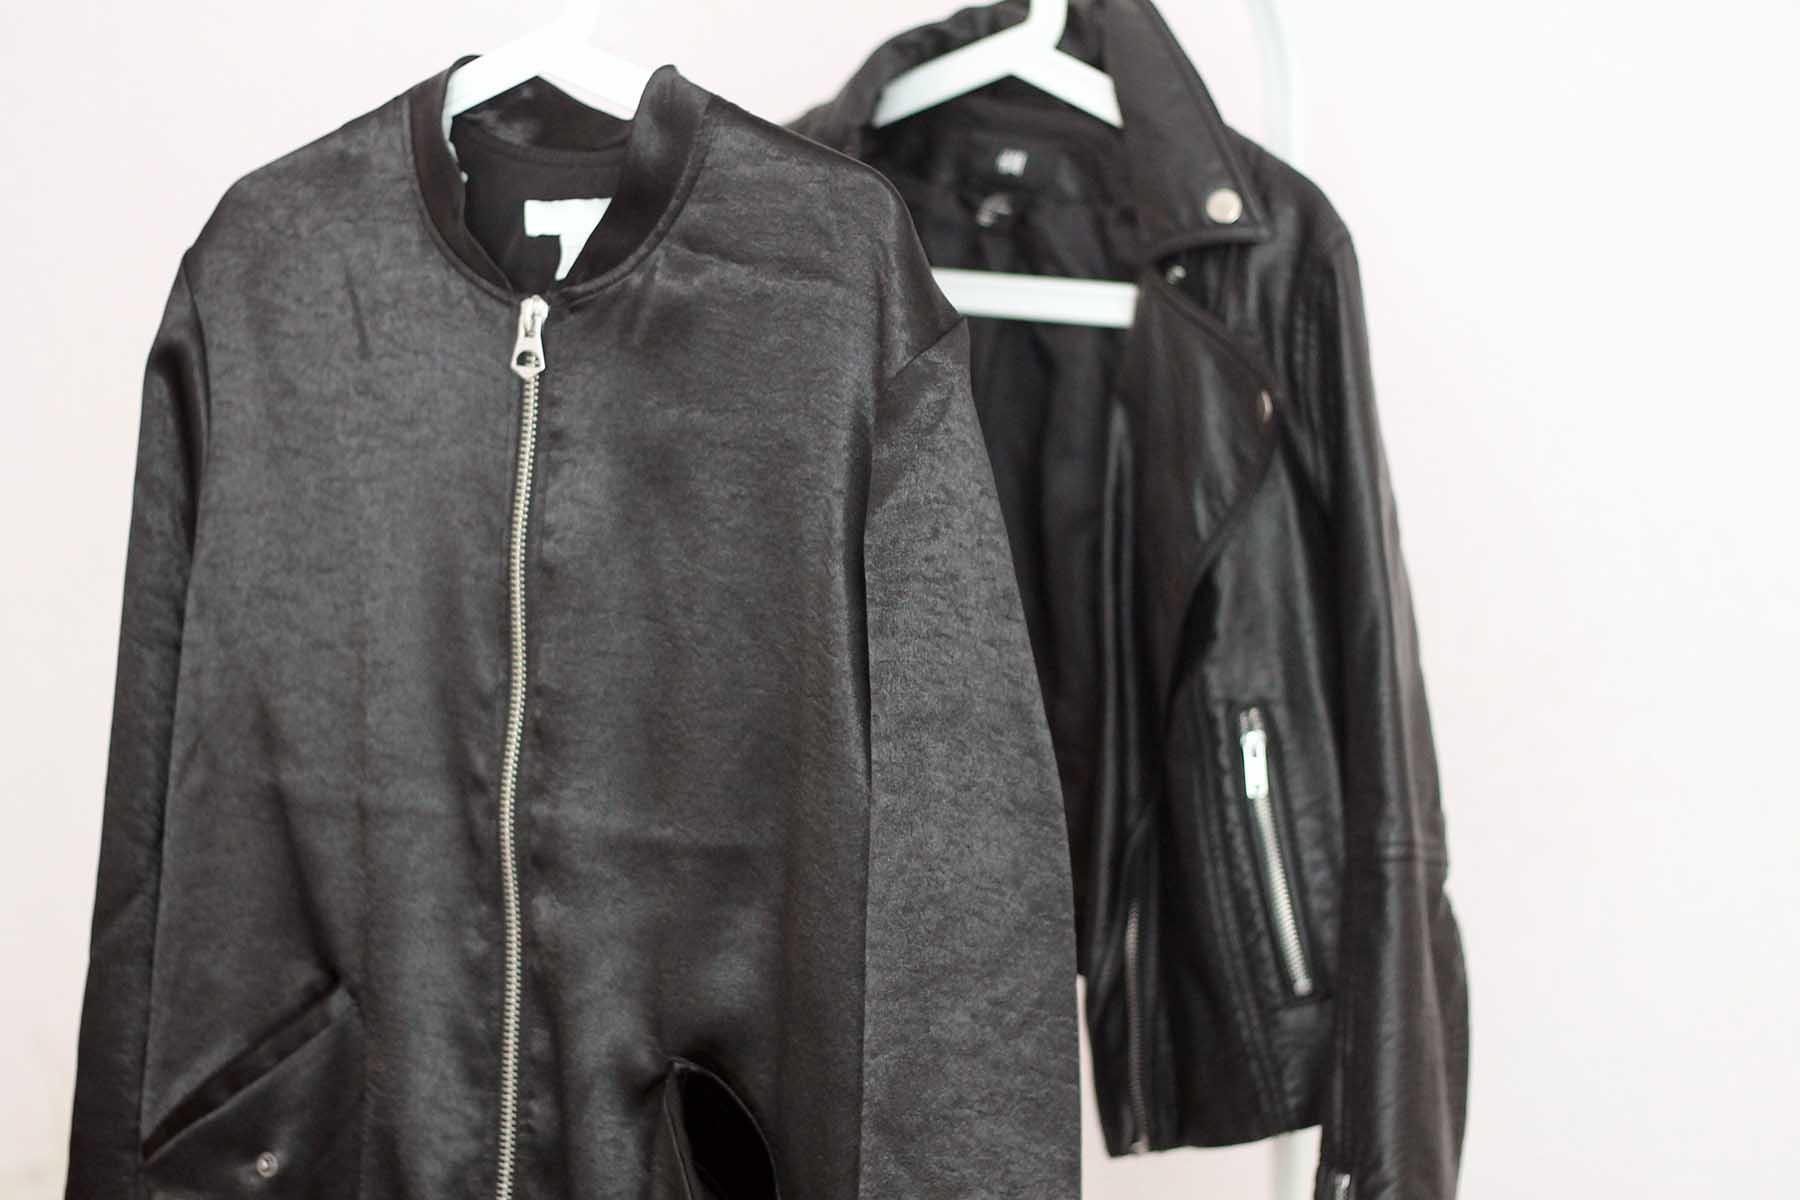 BASIC-must-haves-modeblog-fashionblog-bomberjacke-lederjacke-h&m